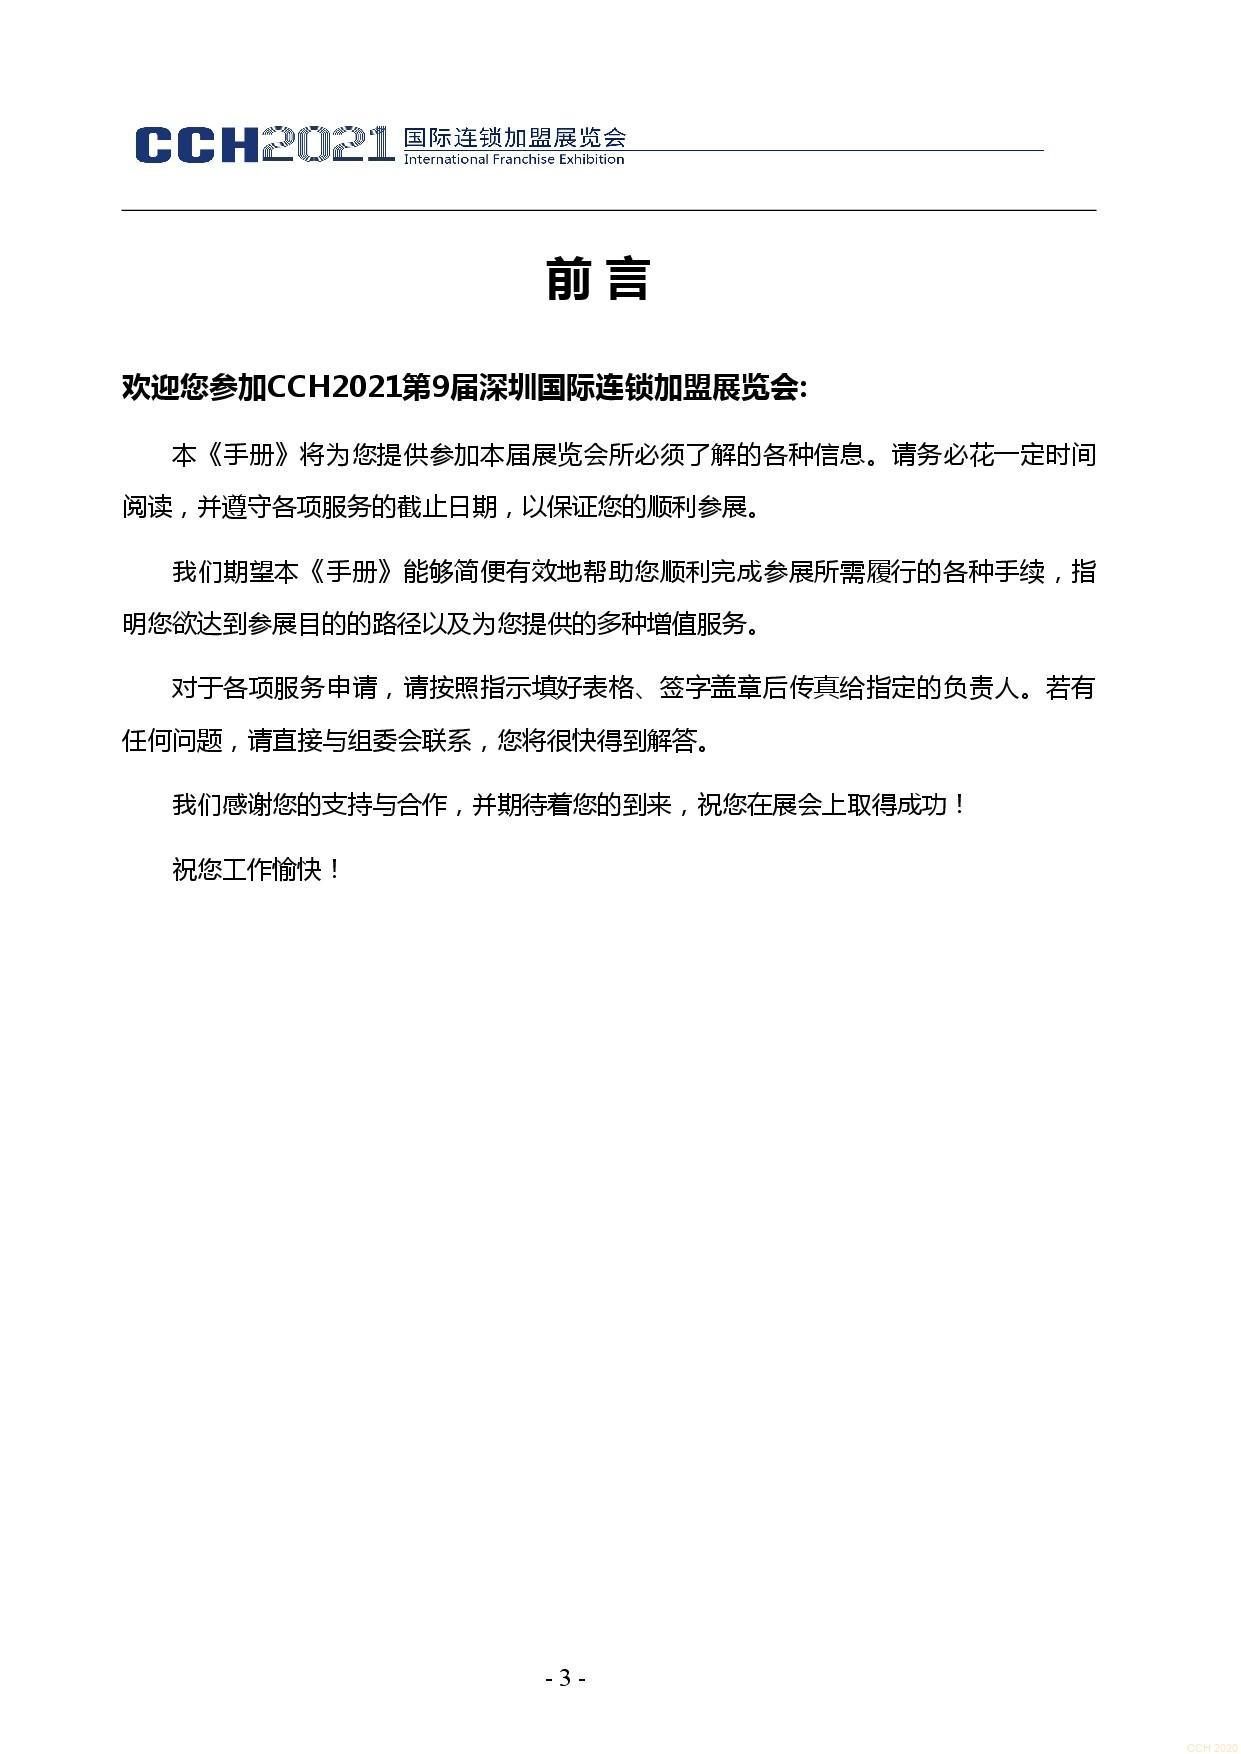 0416CCH深圳展参展商手册4.16-003.jpg